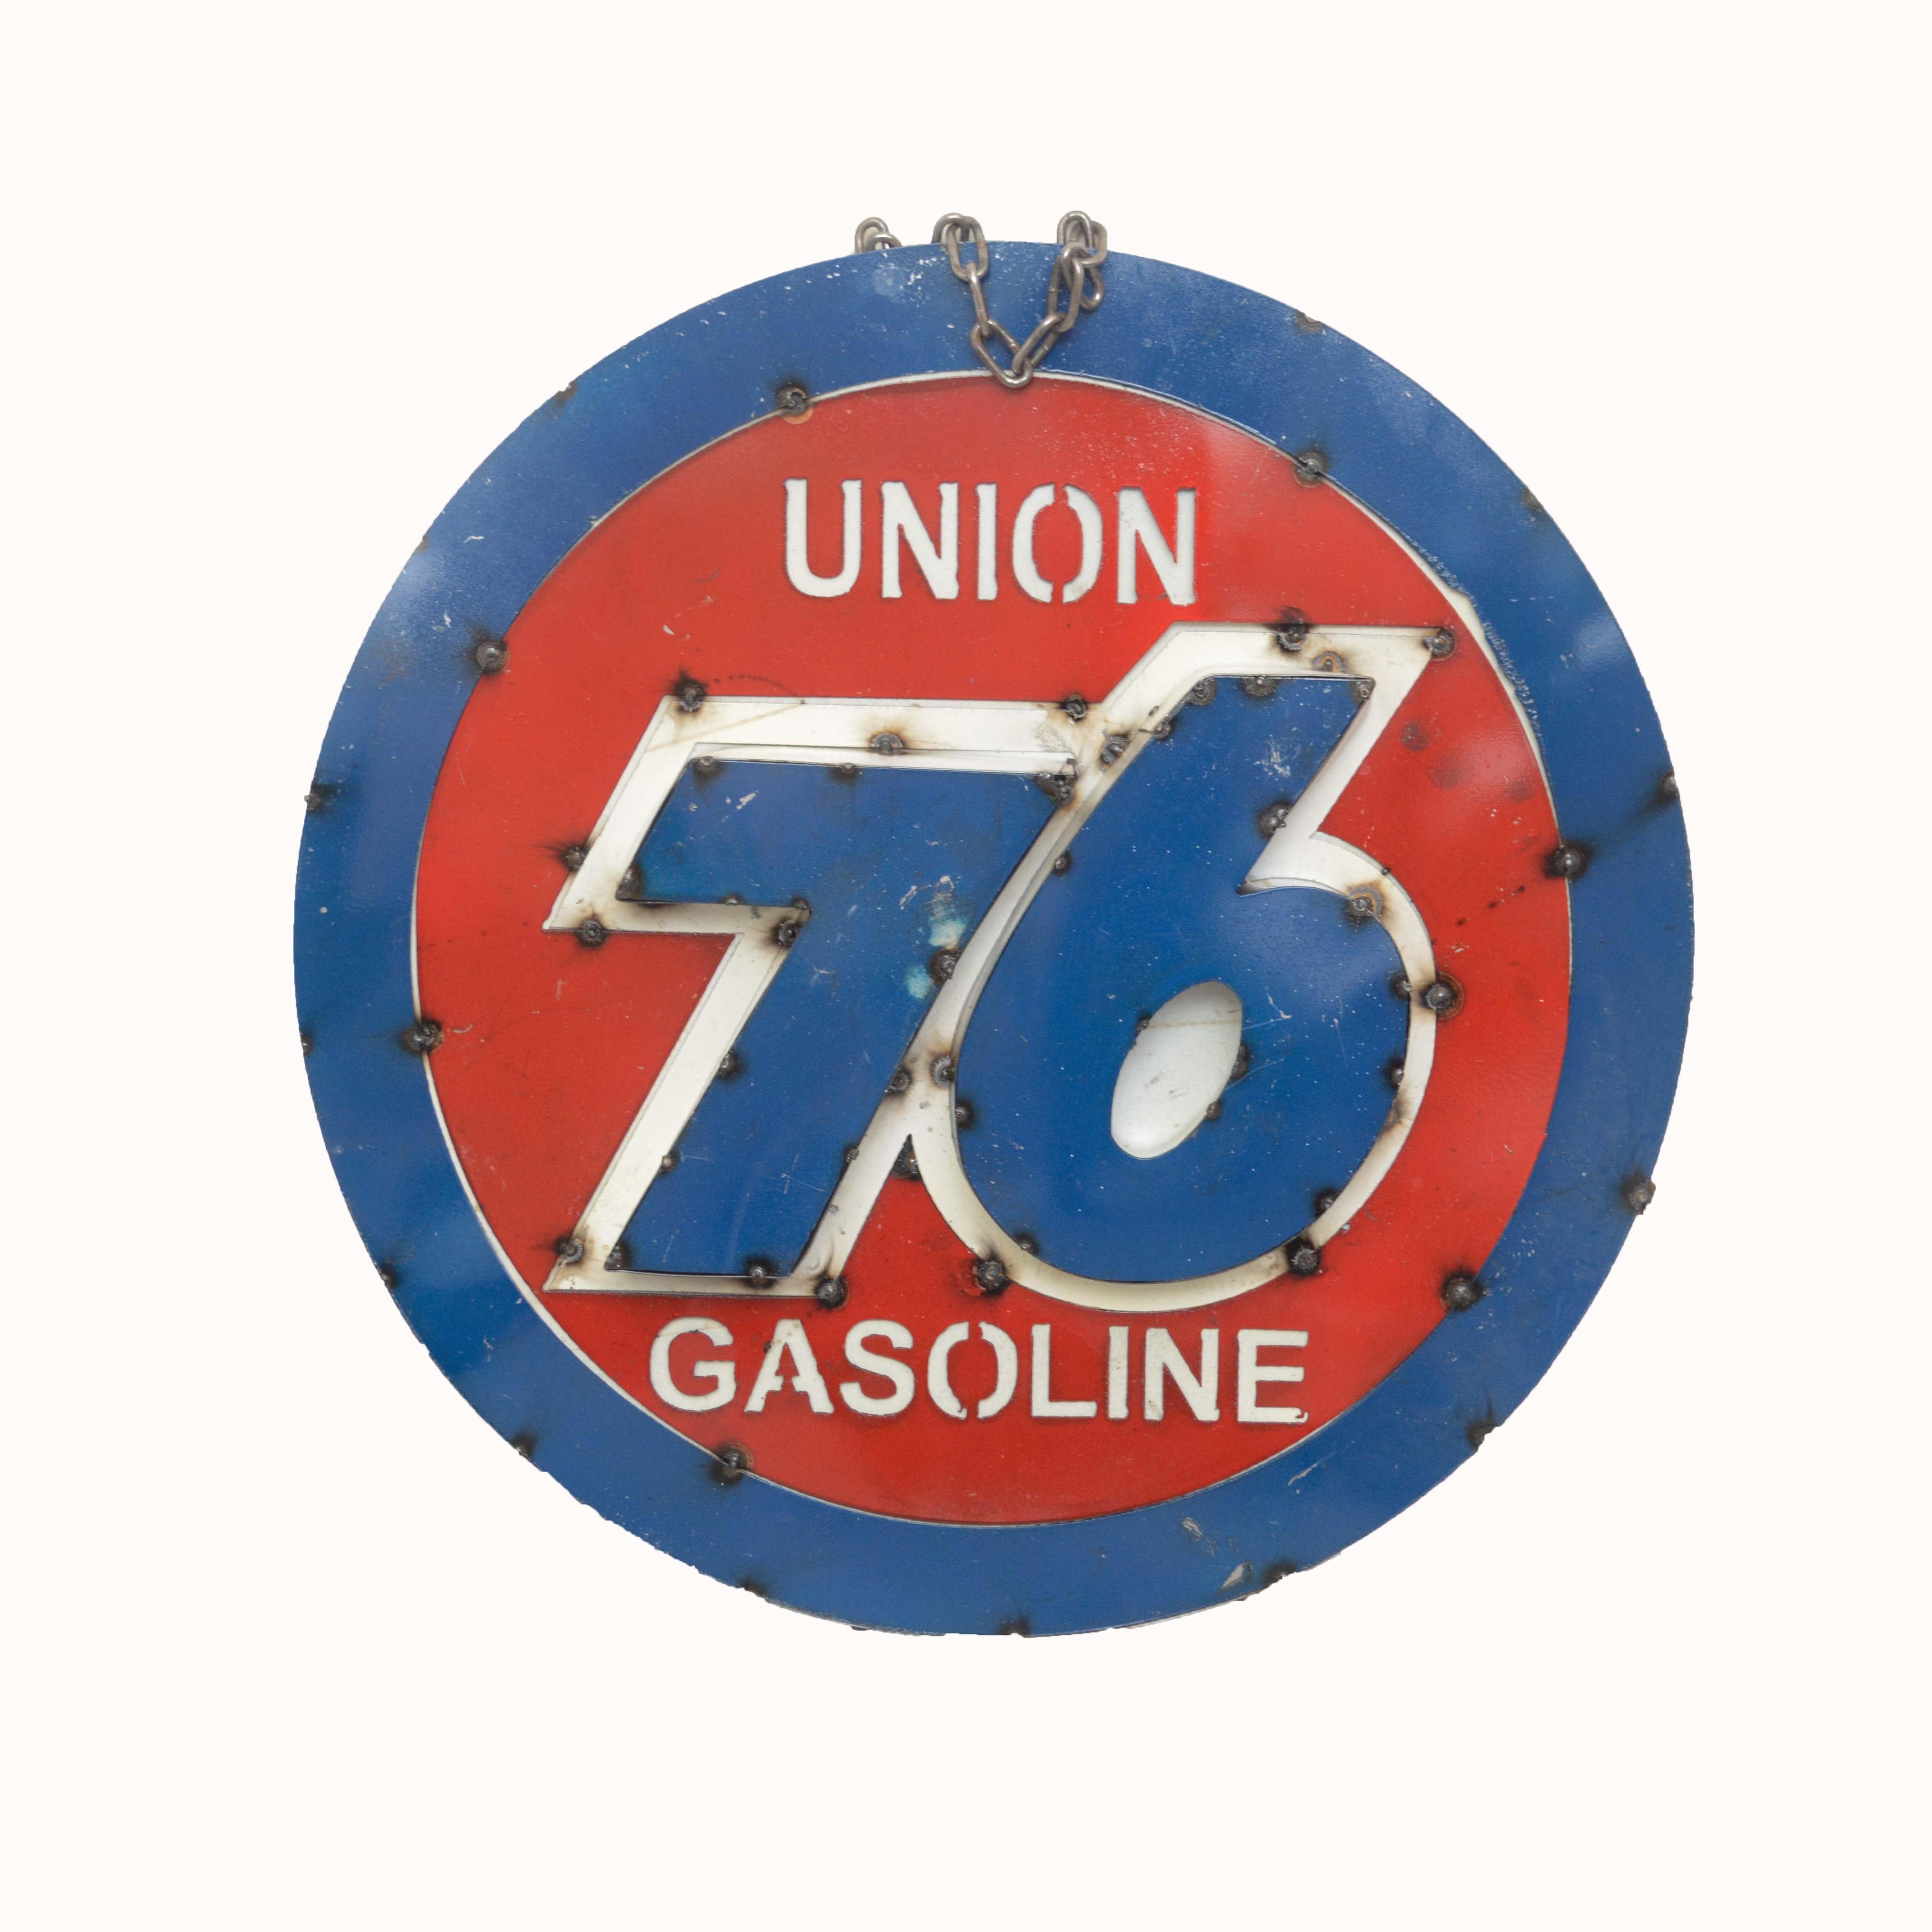 Union 76 Gasoline Three Dimensional Metal Advertising Sign